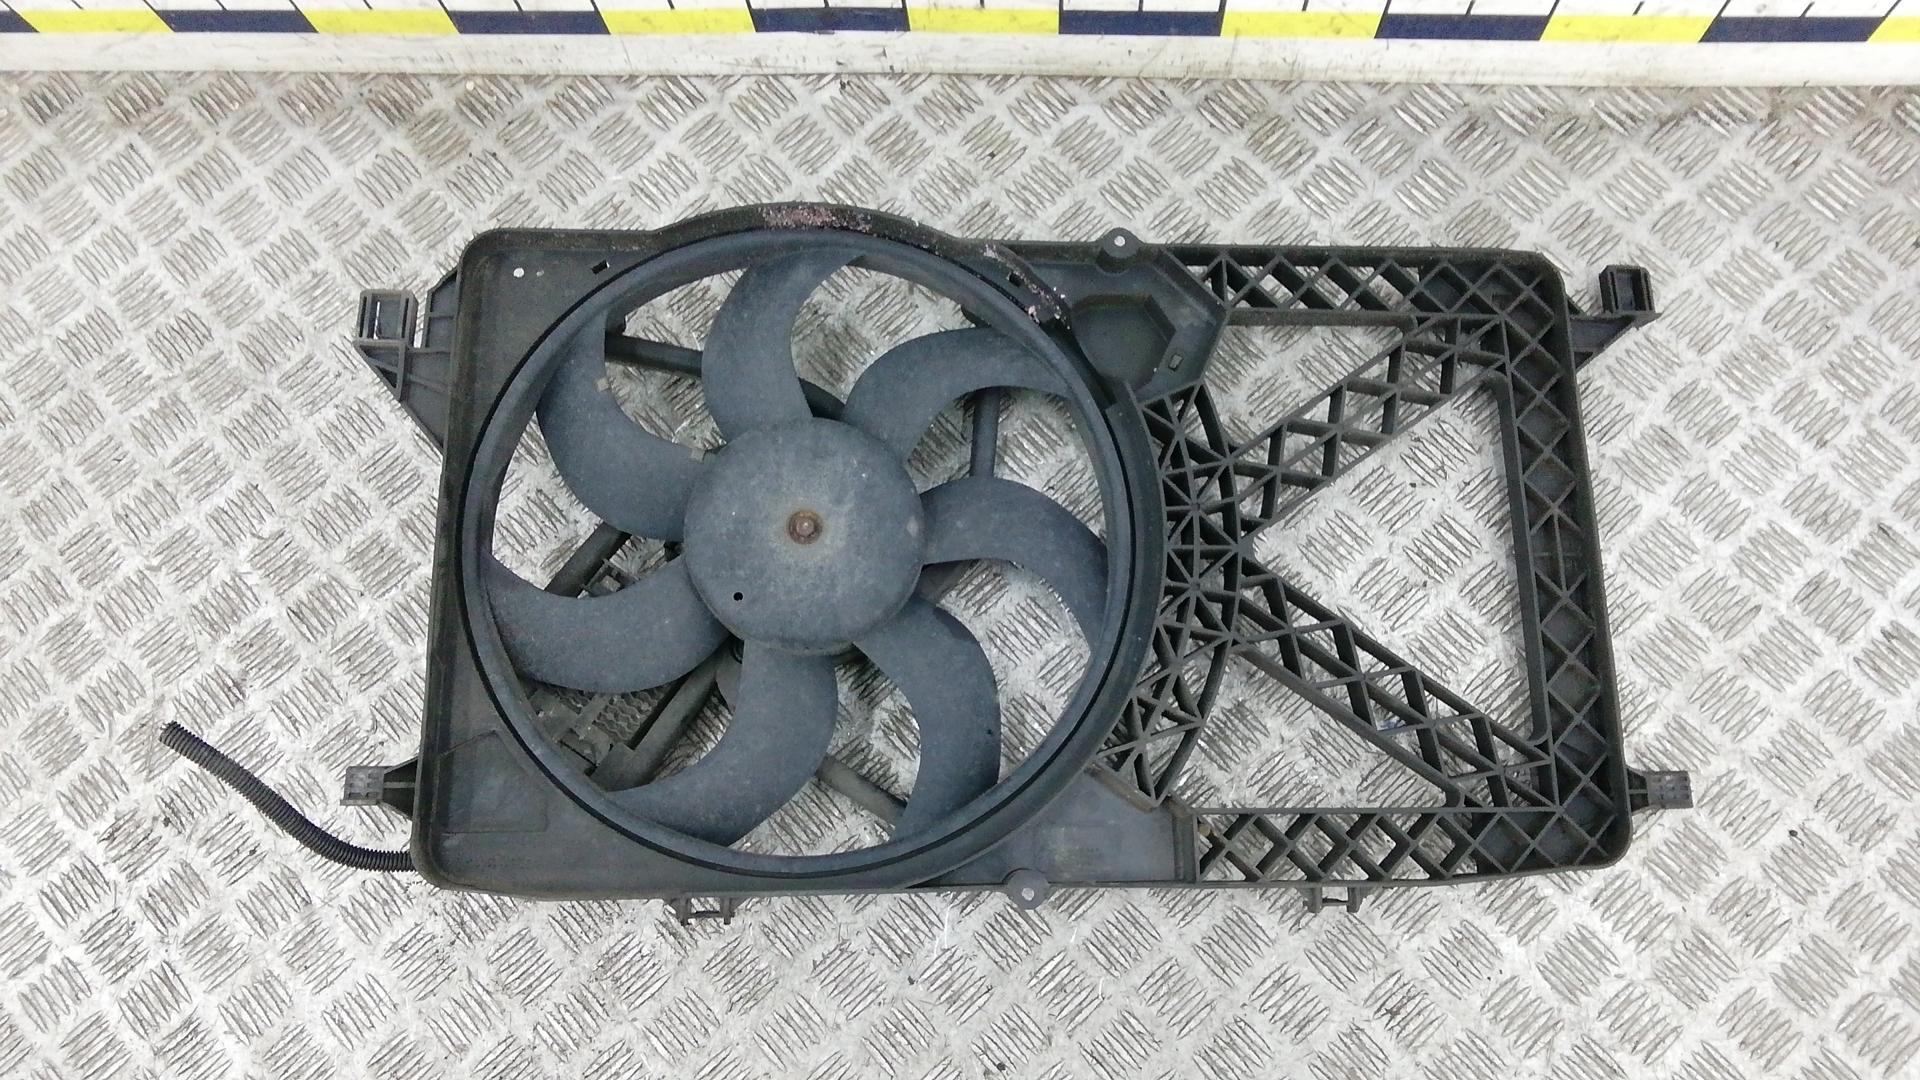 Вентилятор радиатора, FORD, TRANSIT 7, 2006